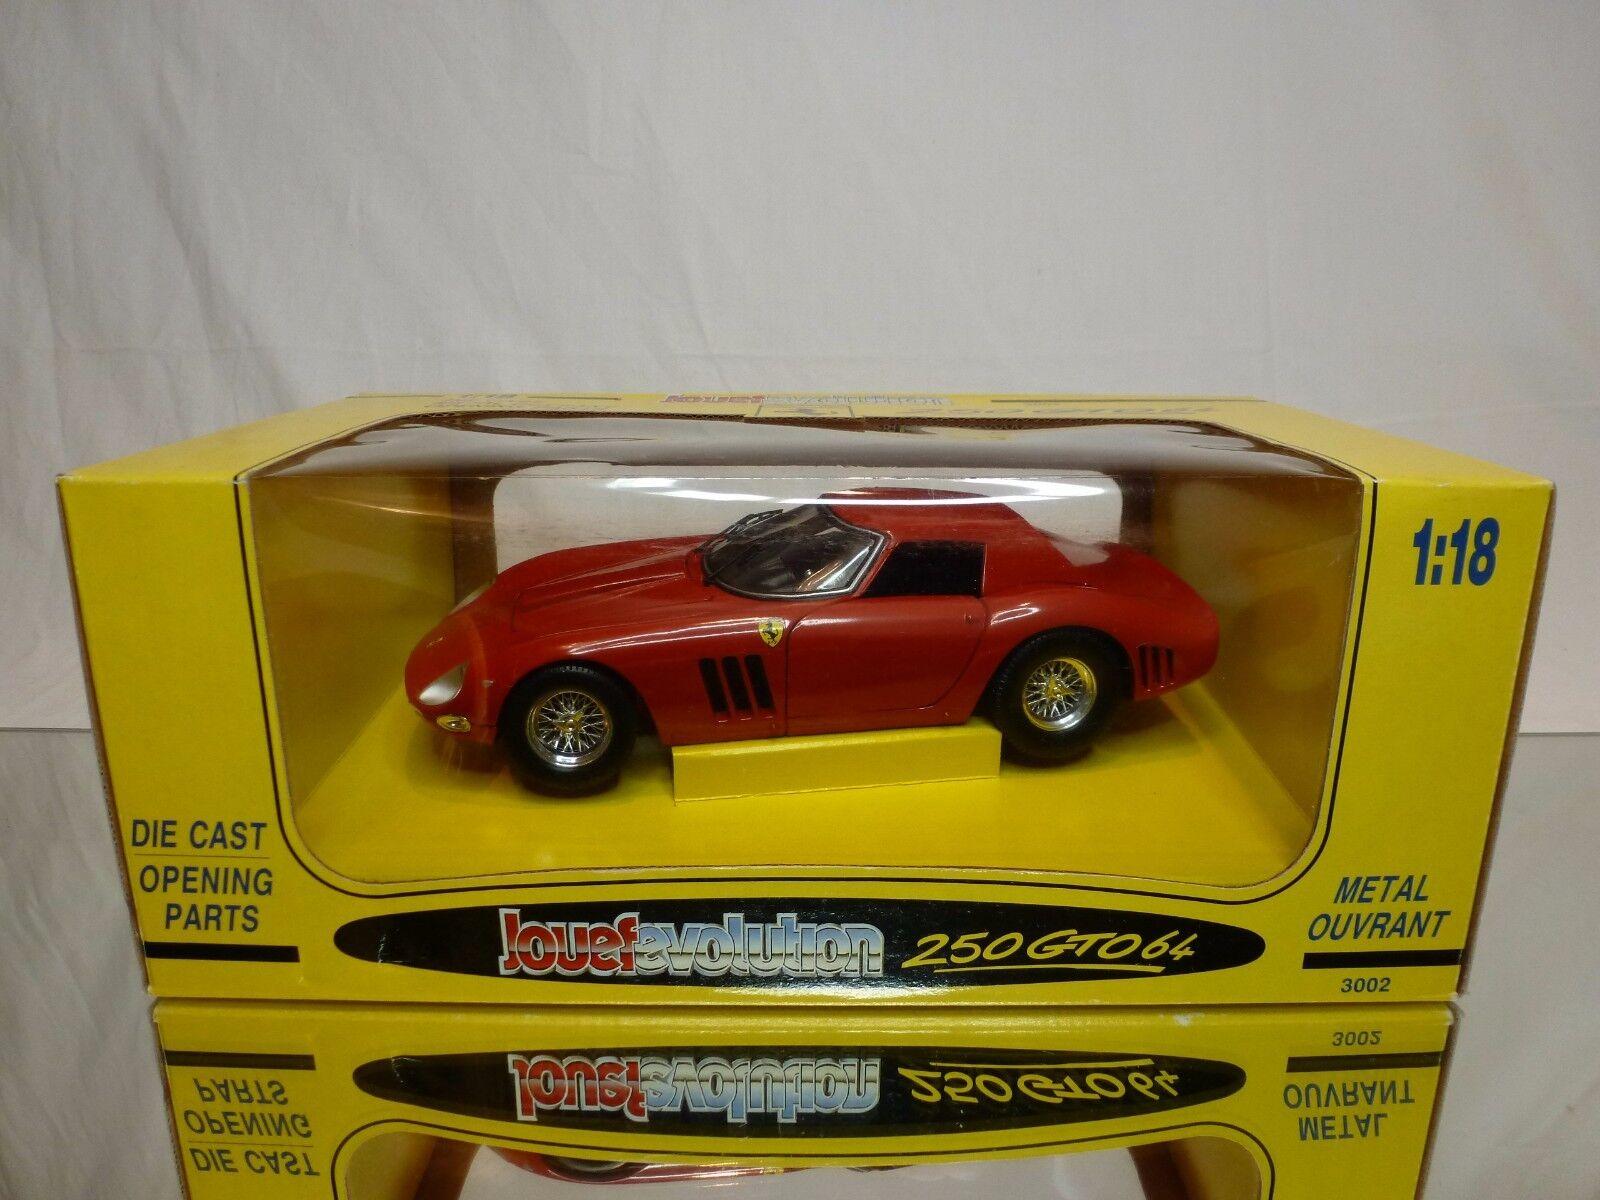 JOUEF EVOLUTION 3002 FERRARI FERRARI FERRARI 250 GTO 1964 - RED 1 18 - EXCELLENT IN BOX d26e31